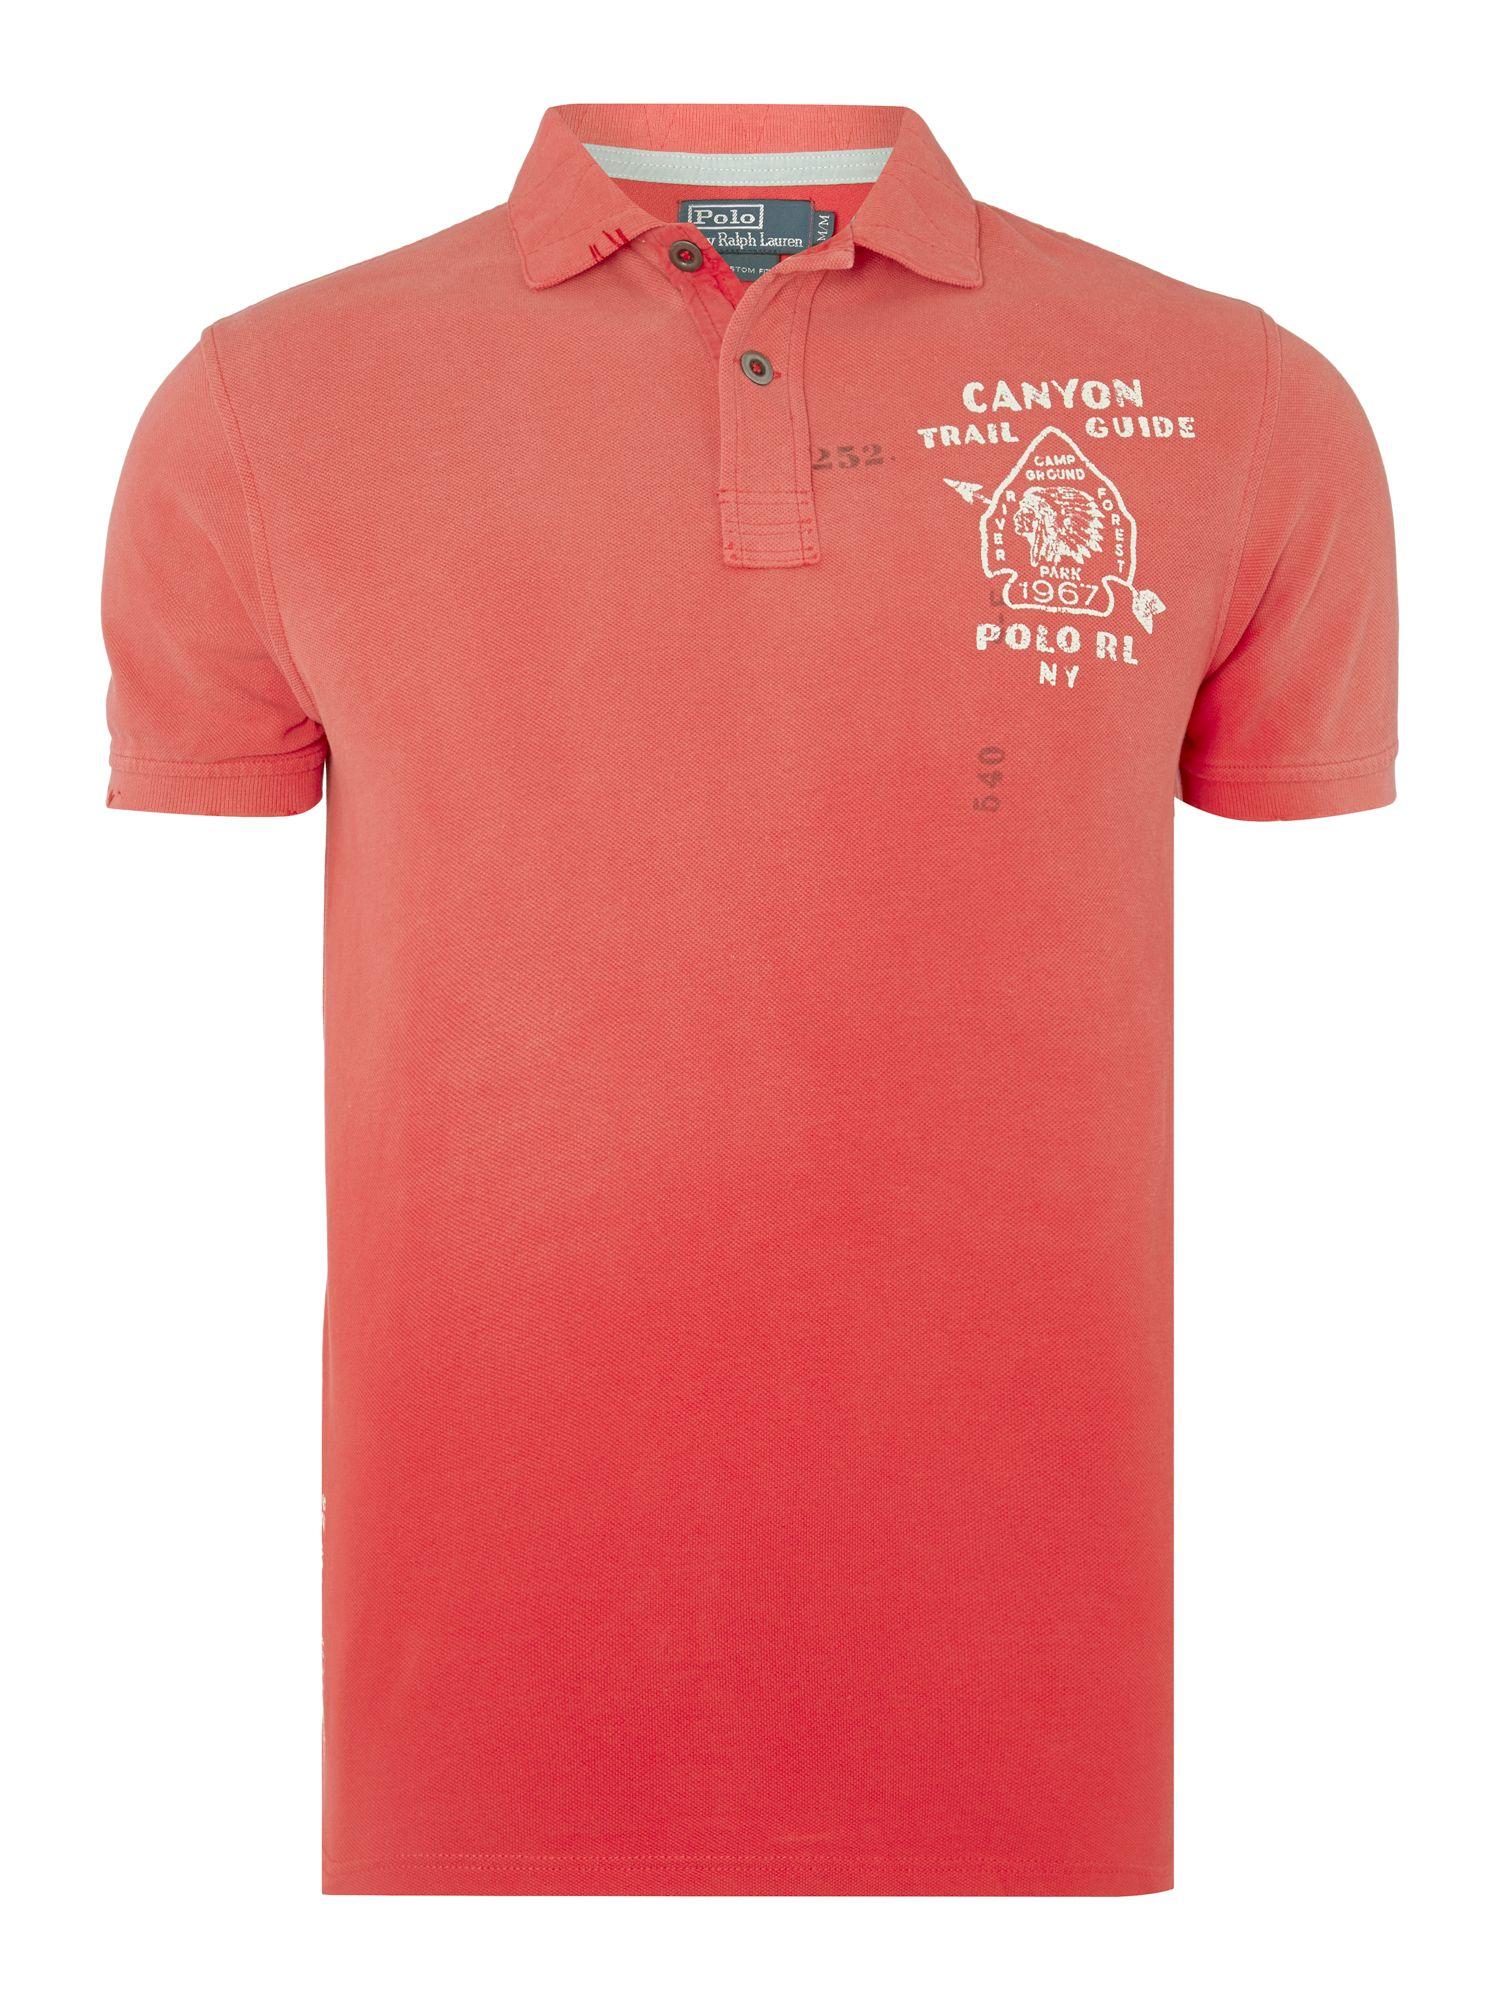 Polo ralph lauren ralph lauren custom fit polo shirt in for Custom tailored polo shirts